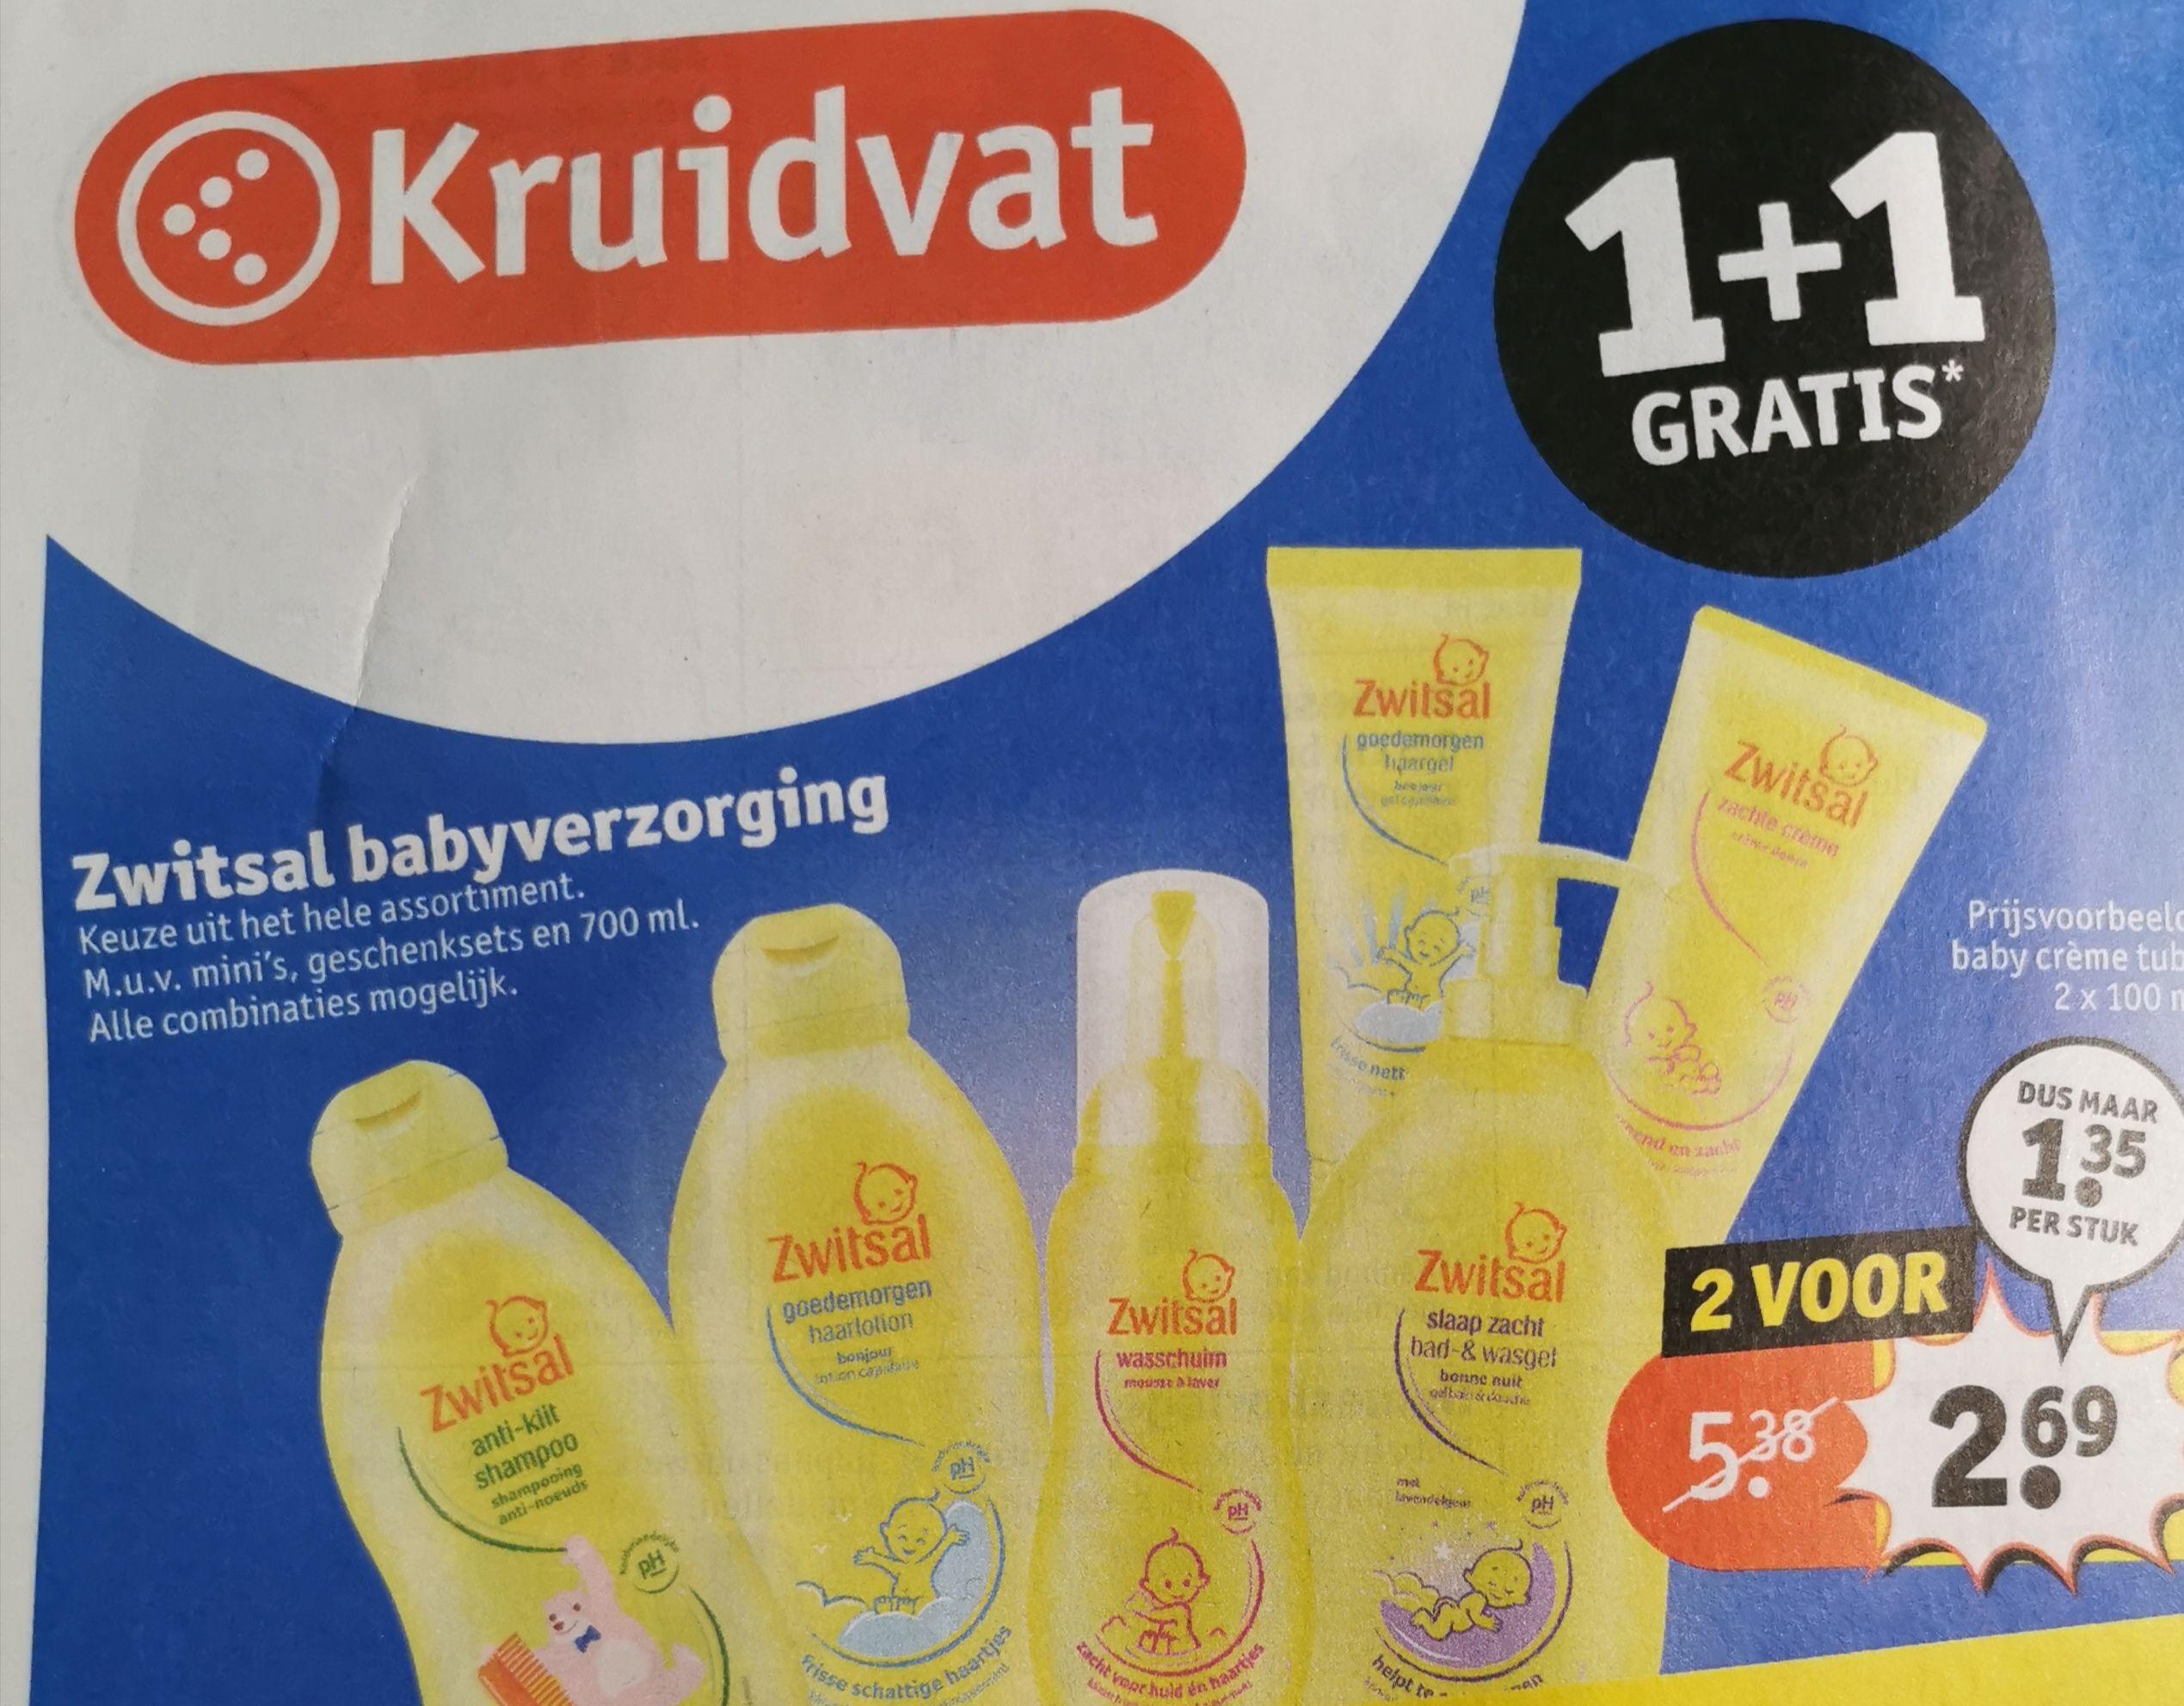 Alle Zwitsal 1 + 1 gratis bij Kruidvat